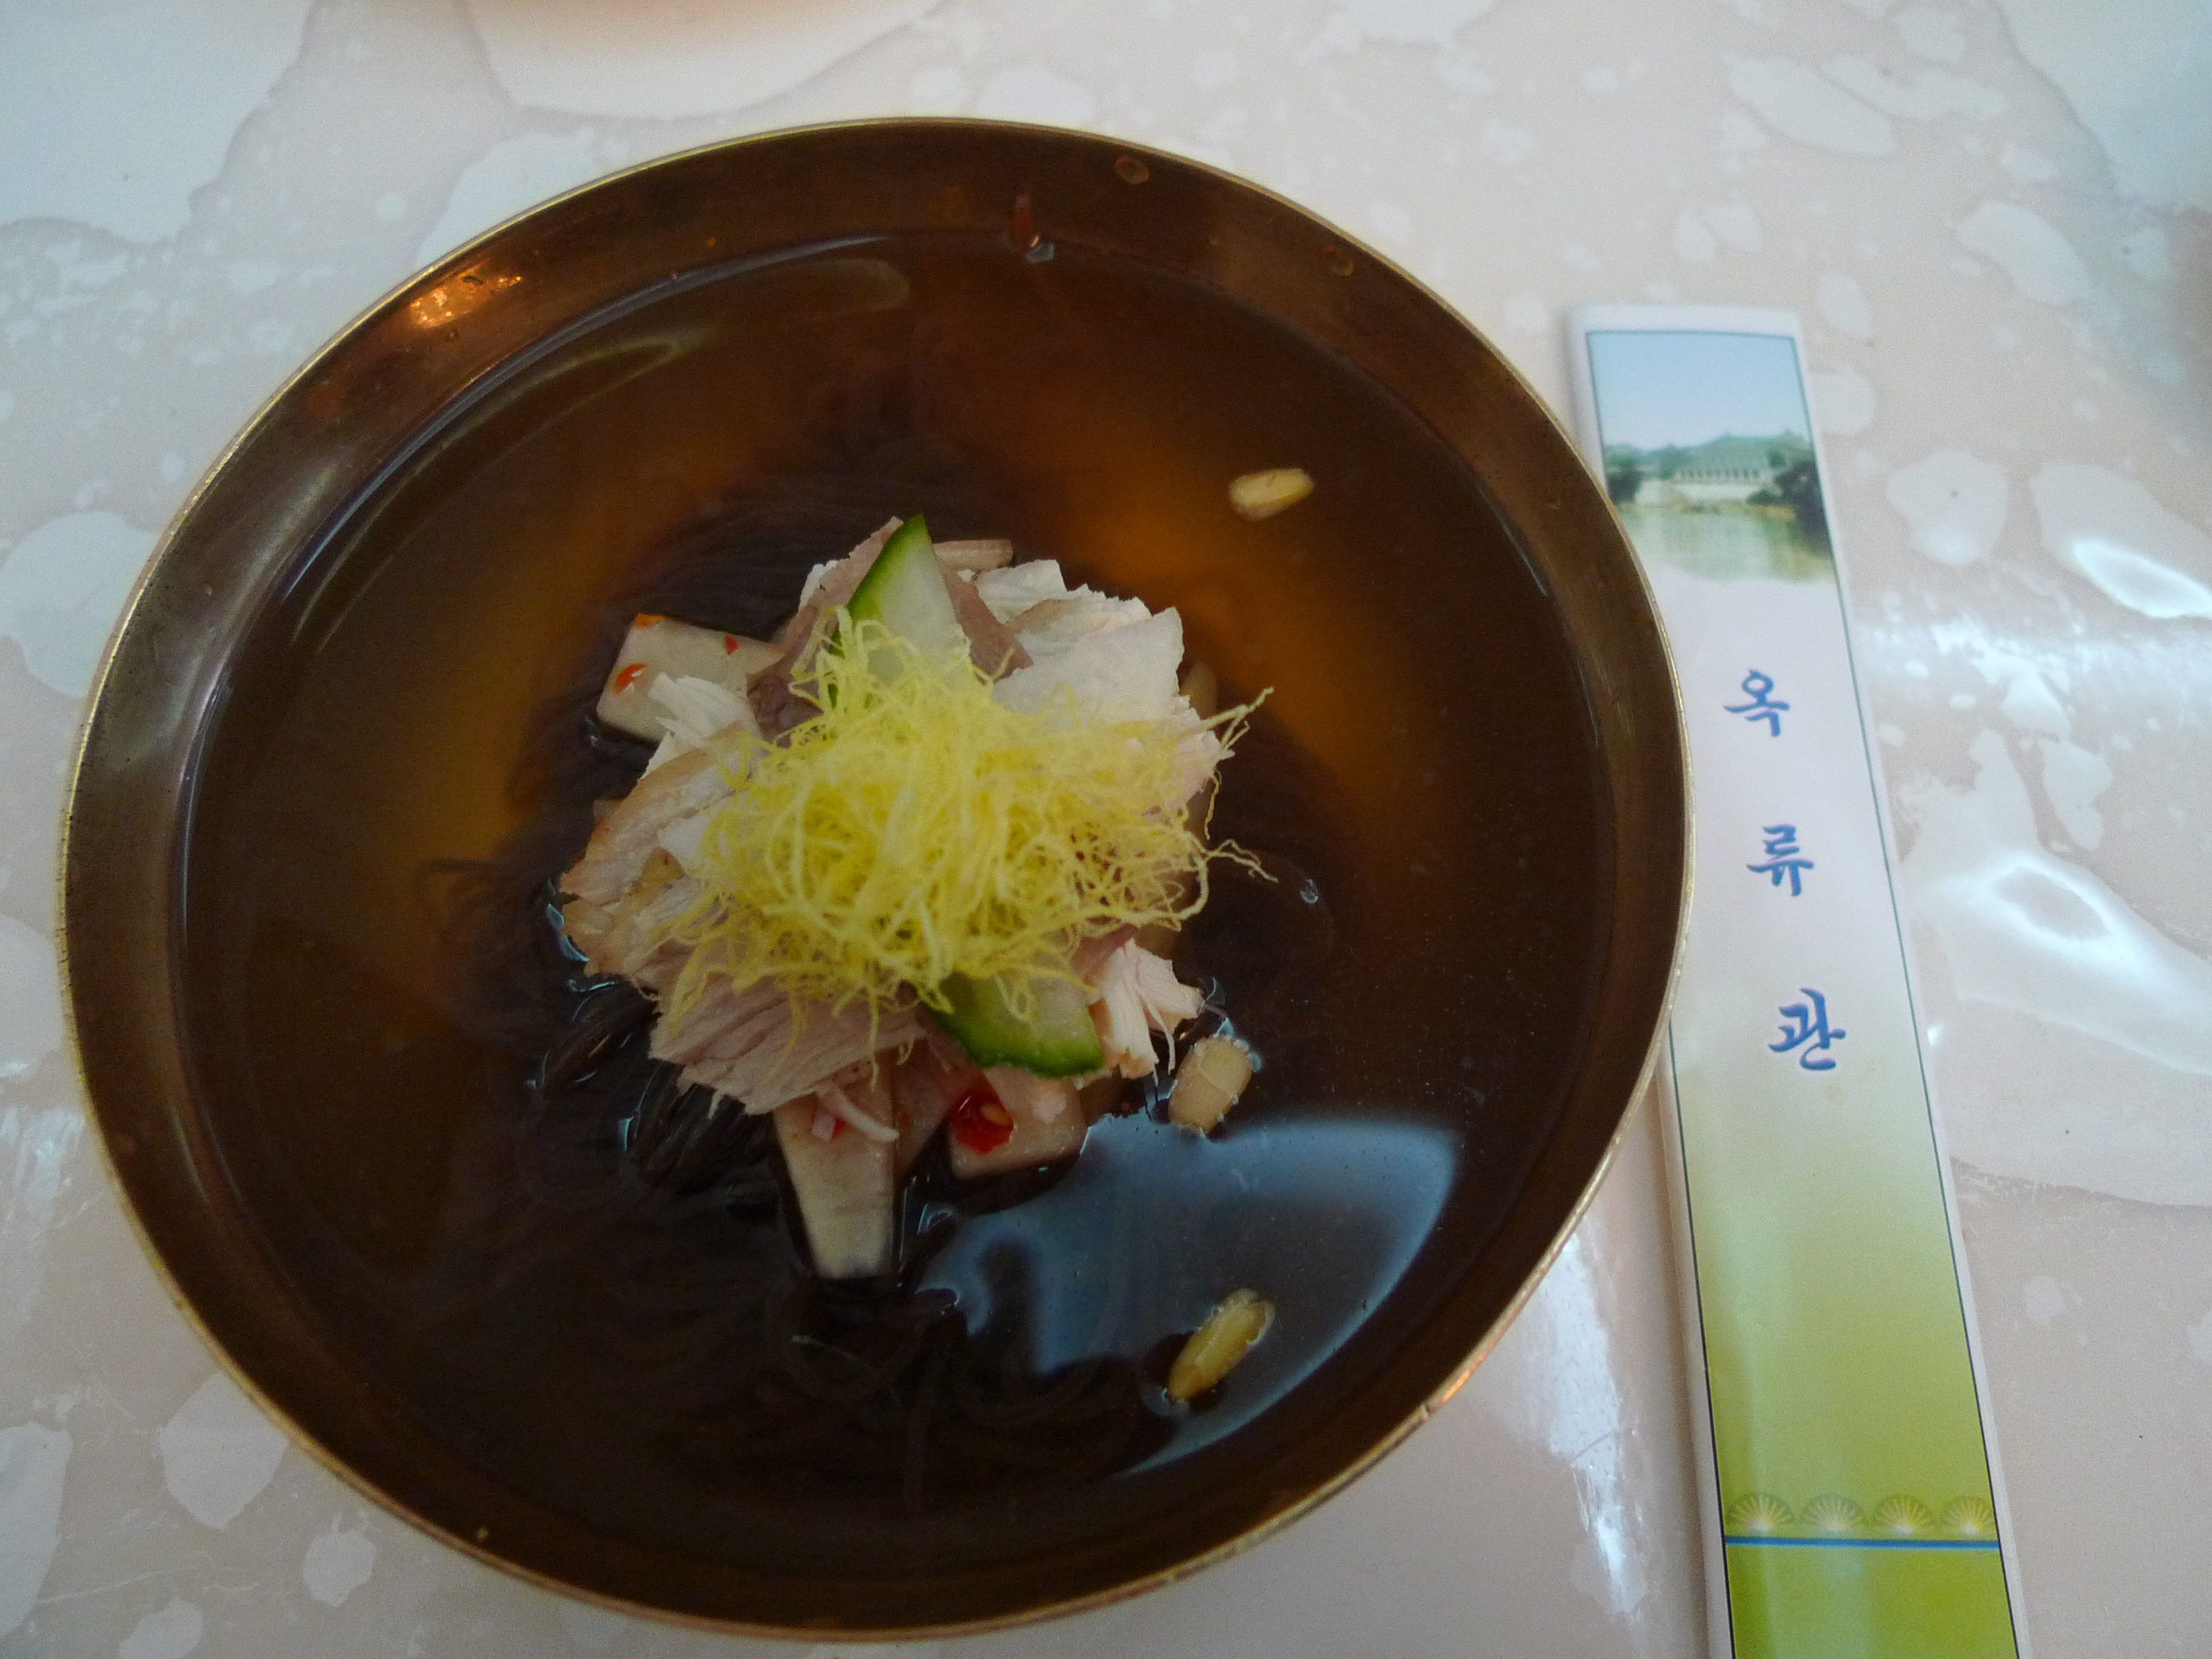 Pyongyang Naengmyun, a dish of cold noodles.